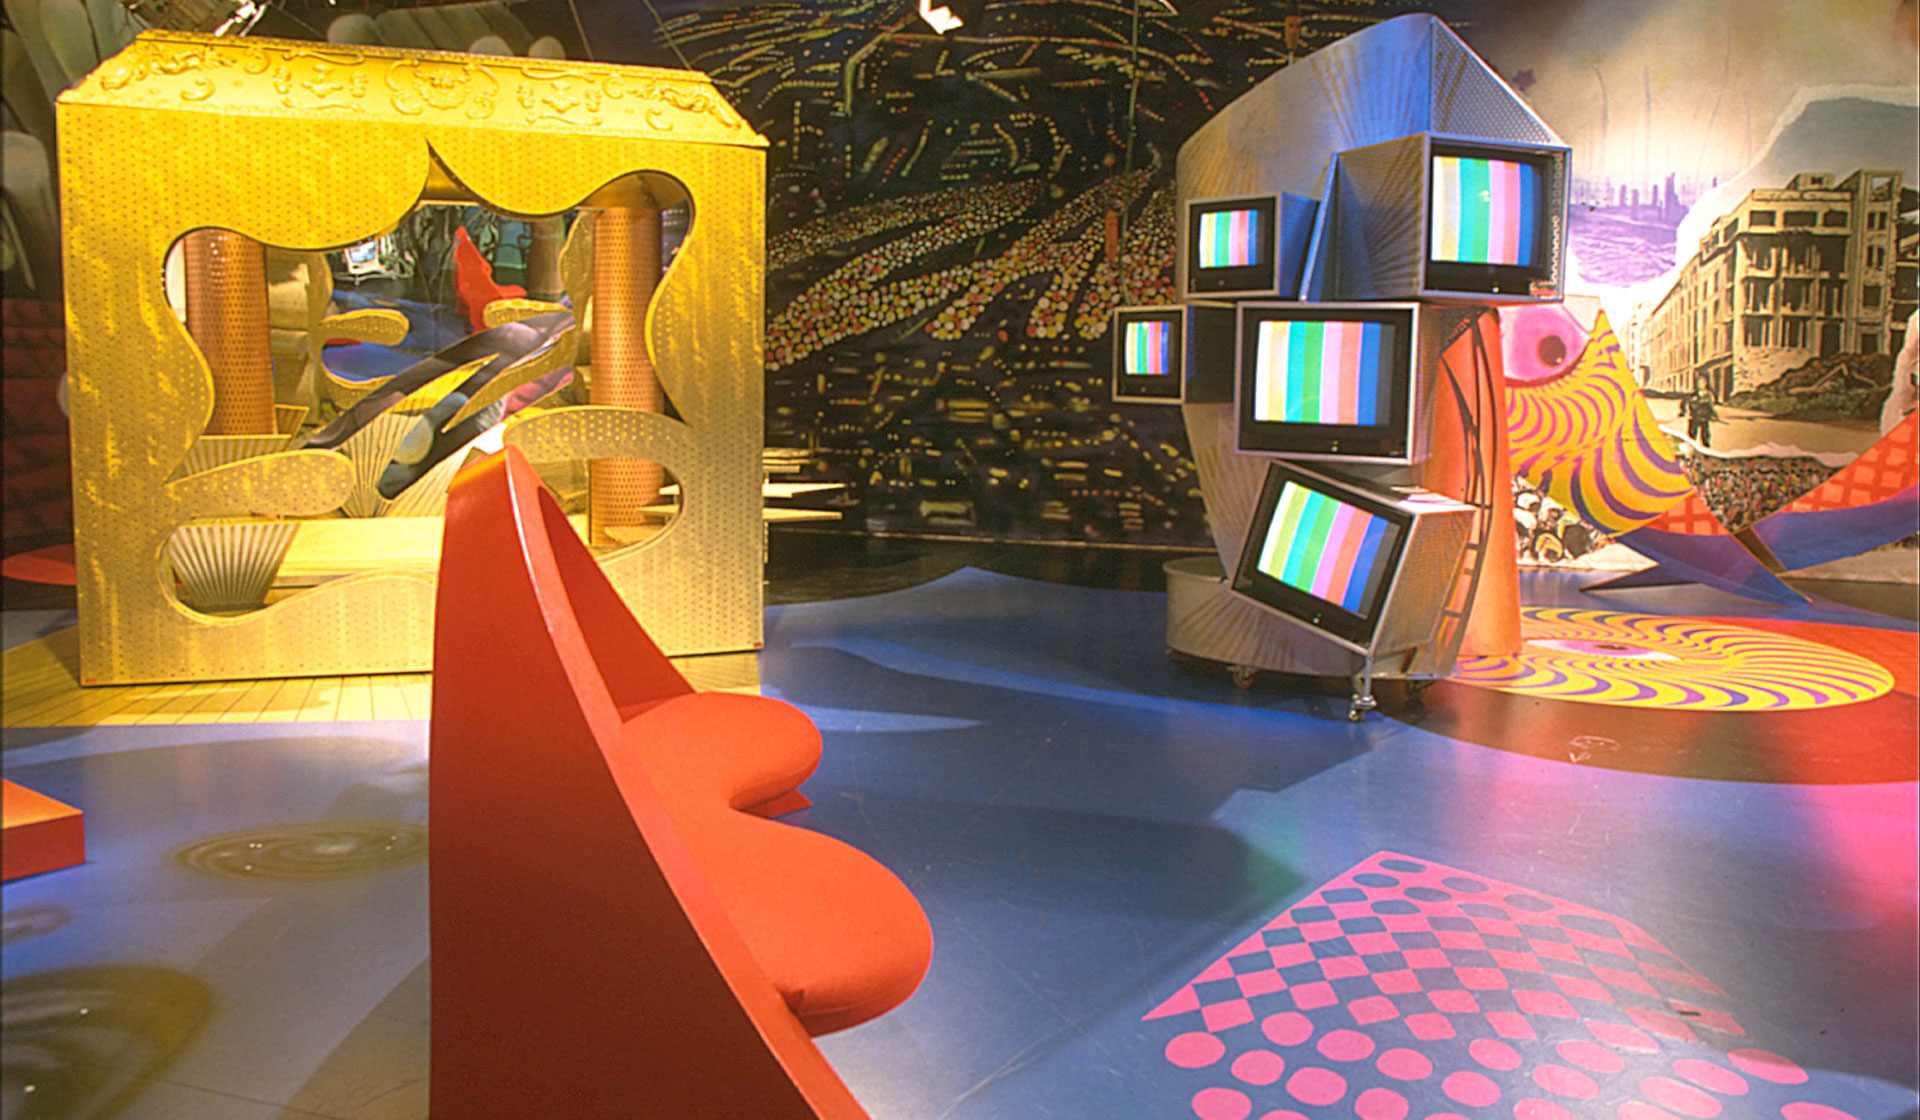 Studio ZAK